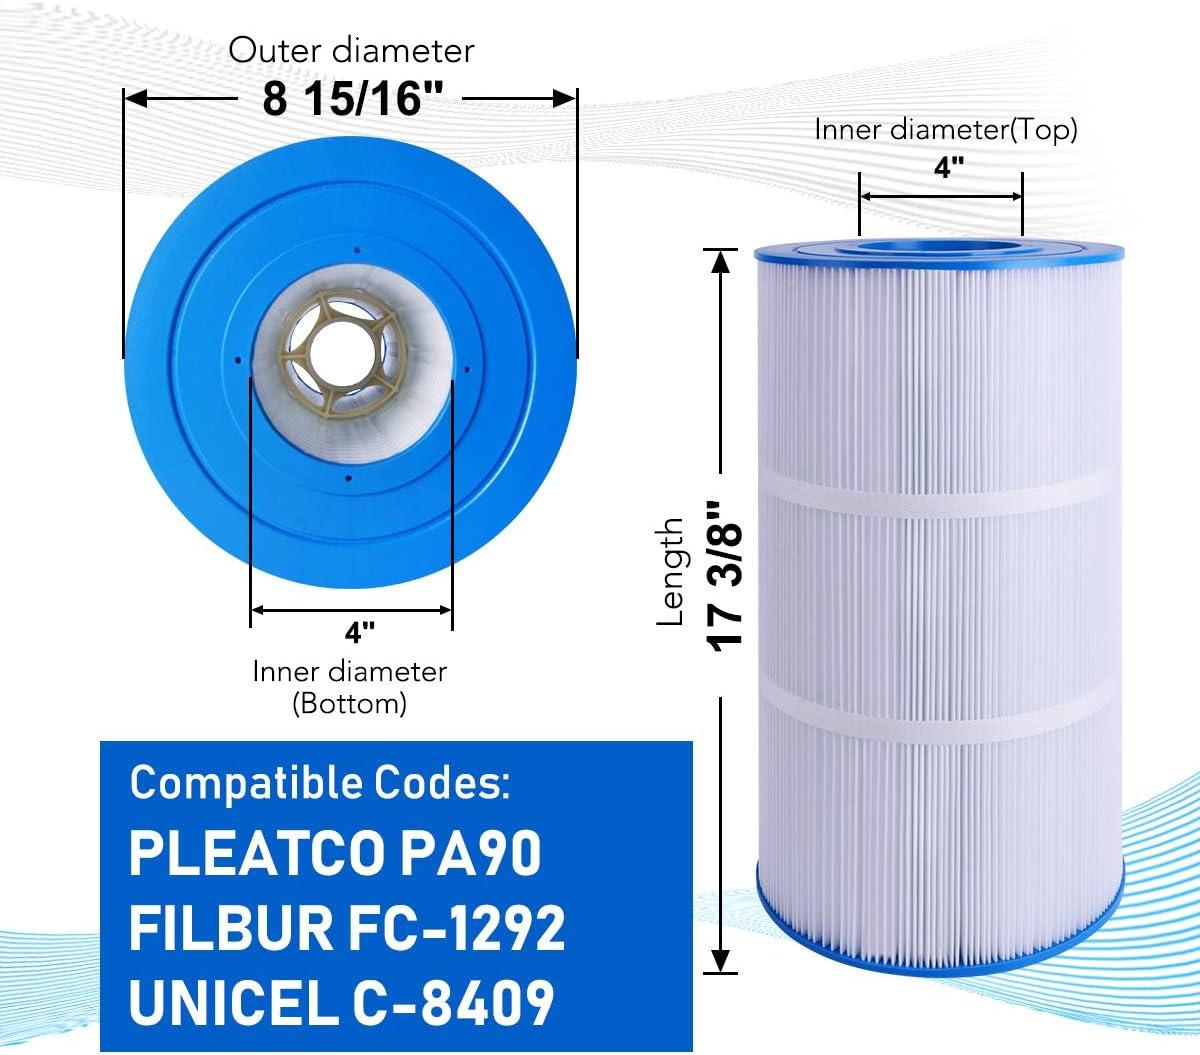 POOLPURE Swimming Pool Filter Replaces for PLEATCO PA90 Hayward CX900RE FILBUR FC-1292 UNICEL C-8409 1 Cartridge